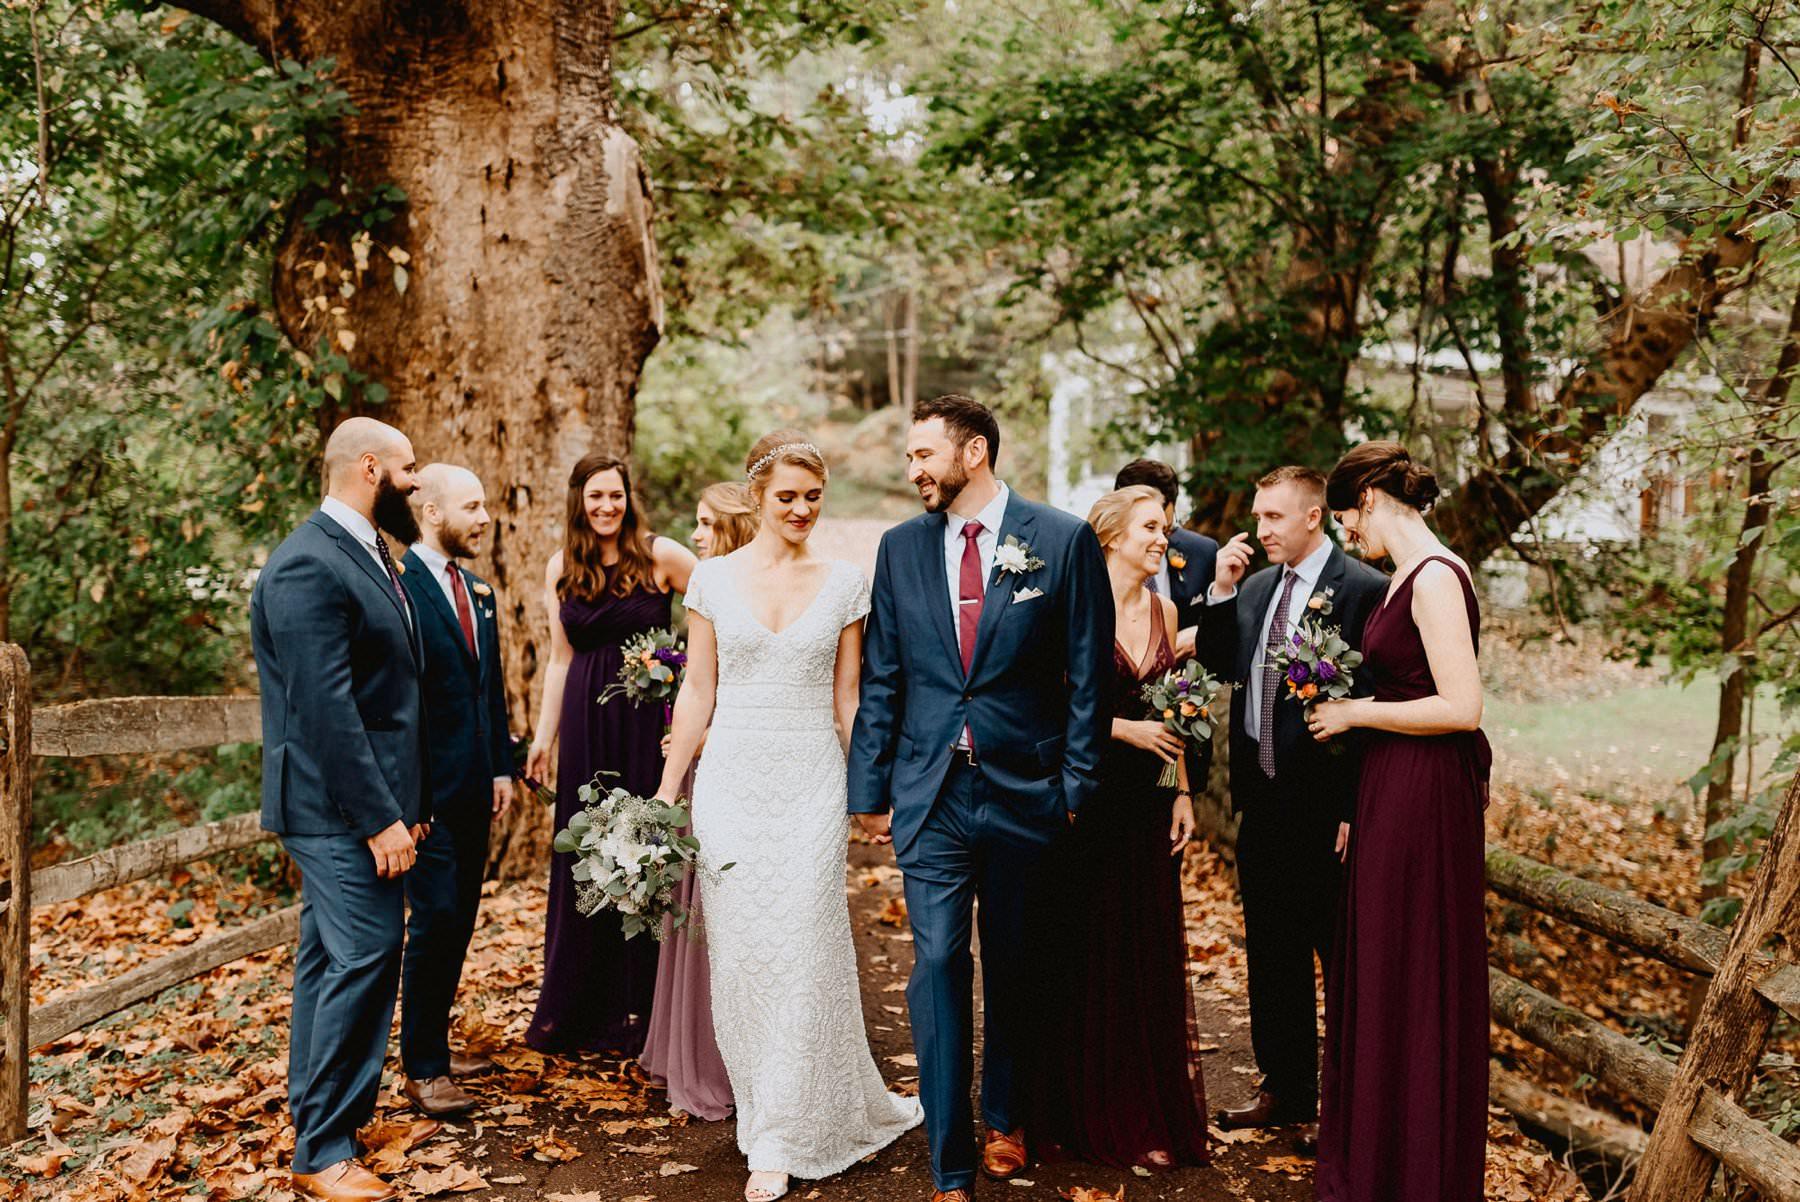 John_James_Audubon_Center_wedding-23.jpg